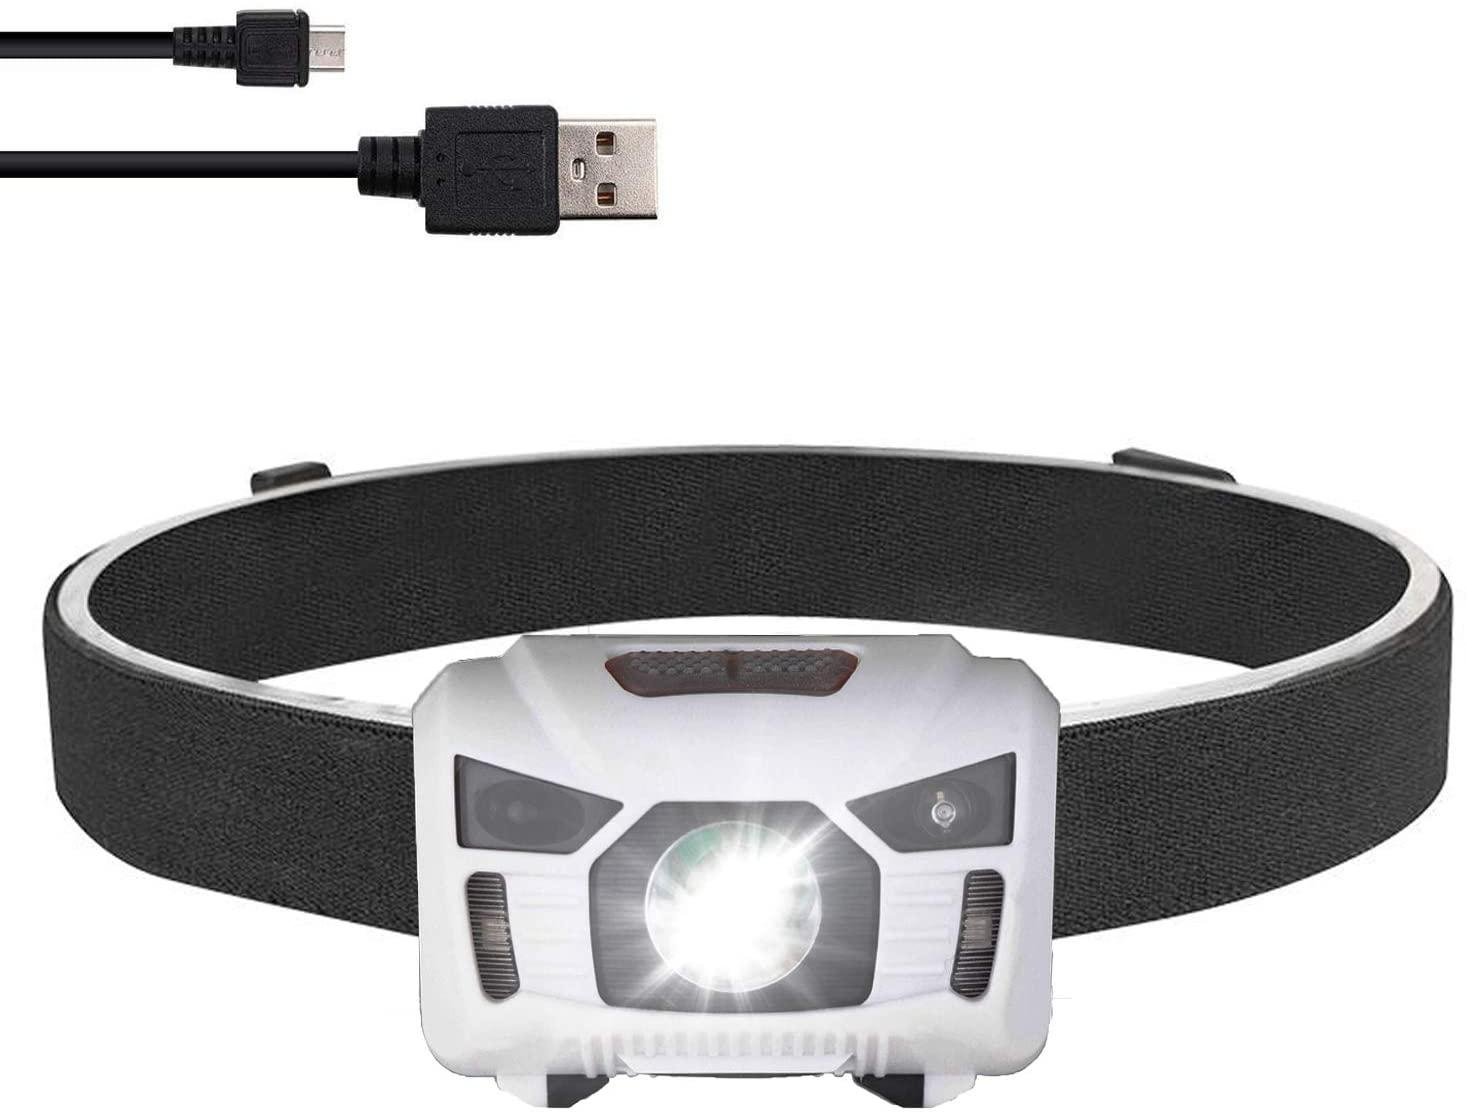 LED Motion Sensor Headlamp Flashlight,USB Rechargeable Headlight for Kids,Adults Camping, Running, Hiking, Sports, Outdoor Head Lamp, IPX4 Waterproof Headlight, 5 Light Modes & Adjustable Headband